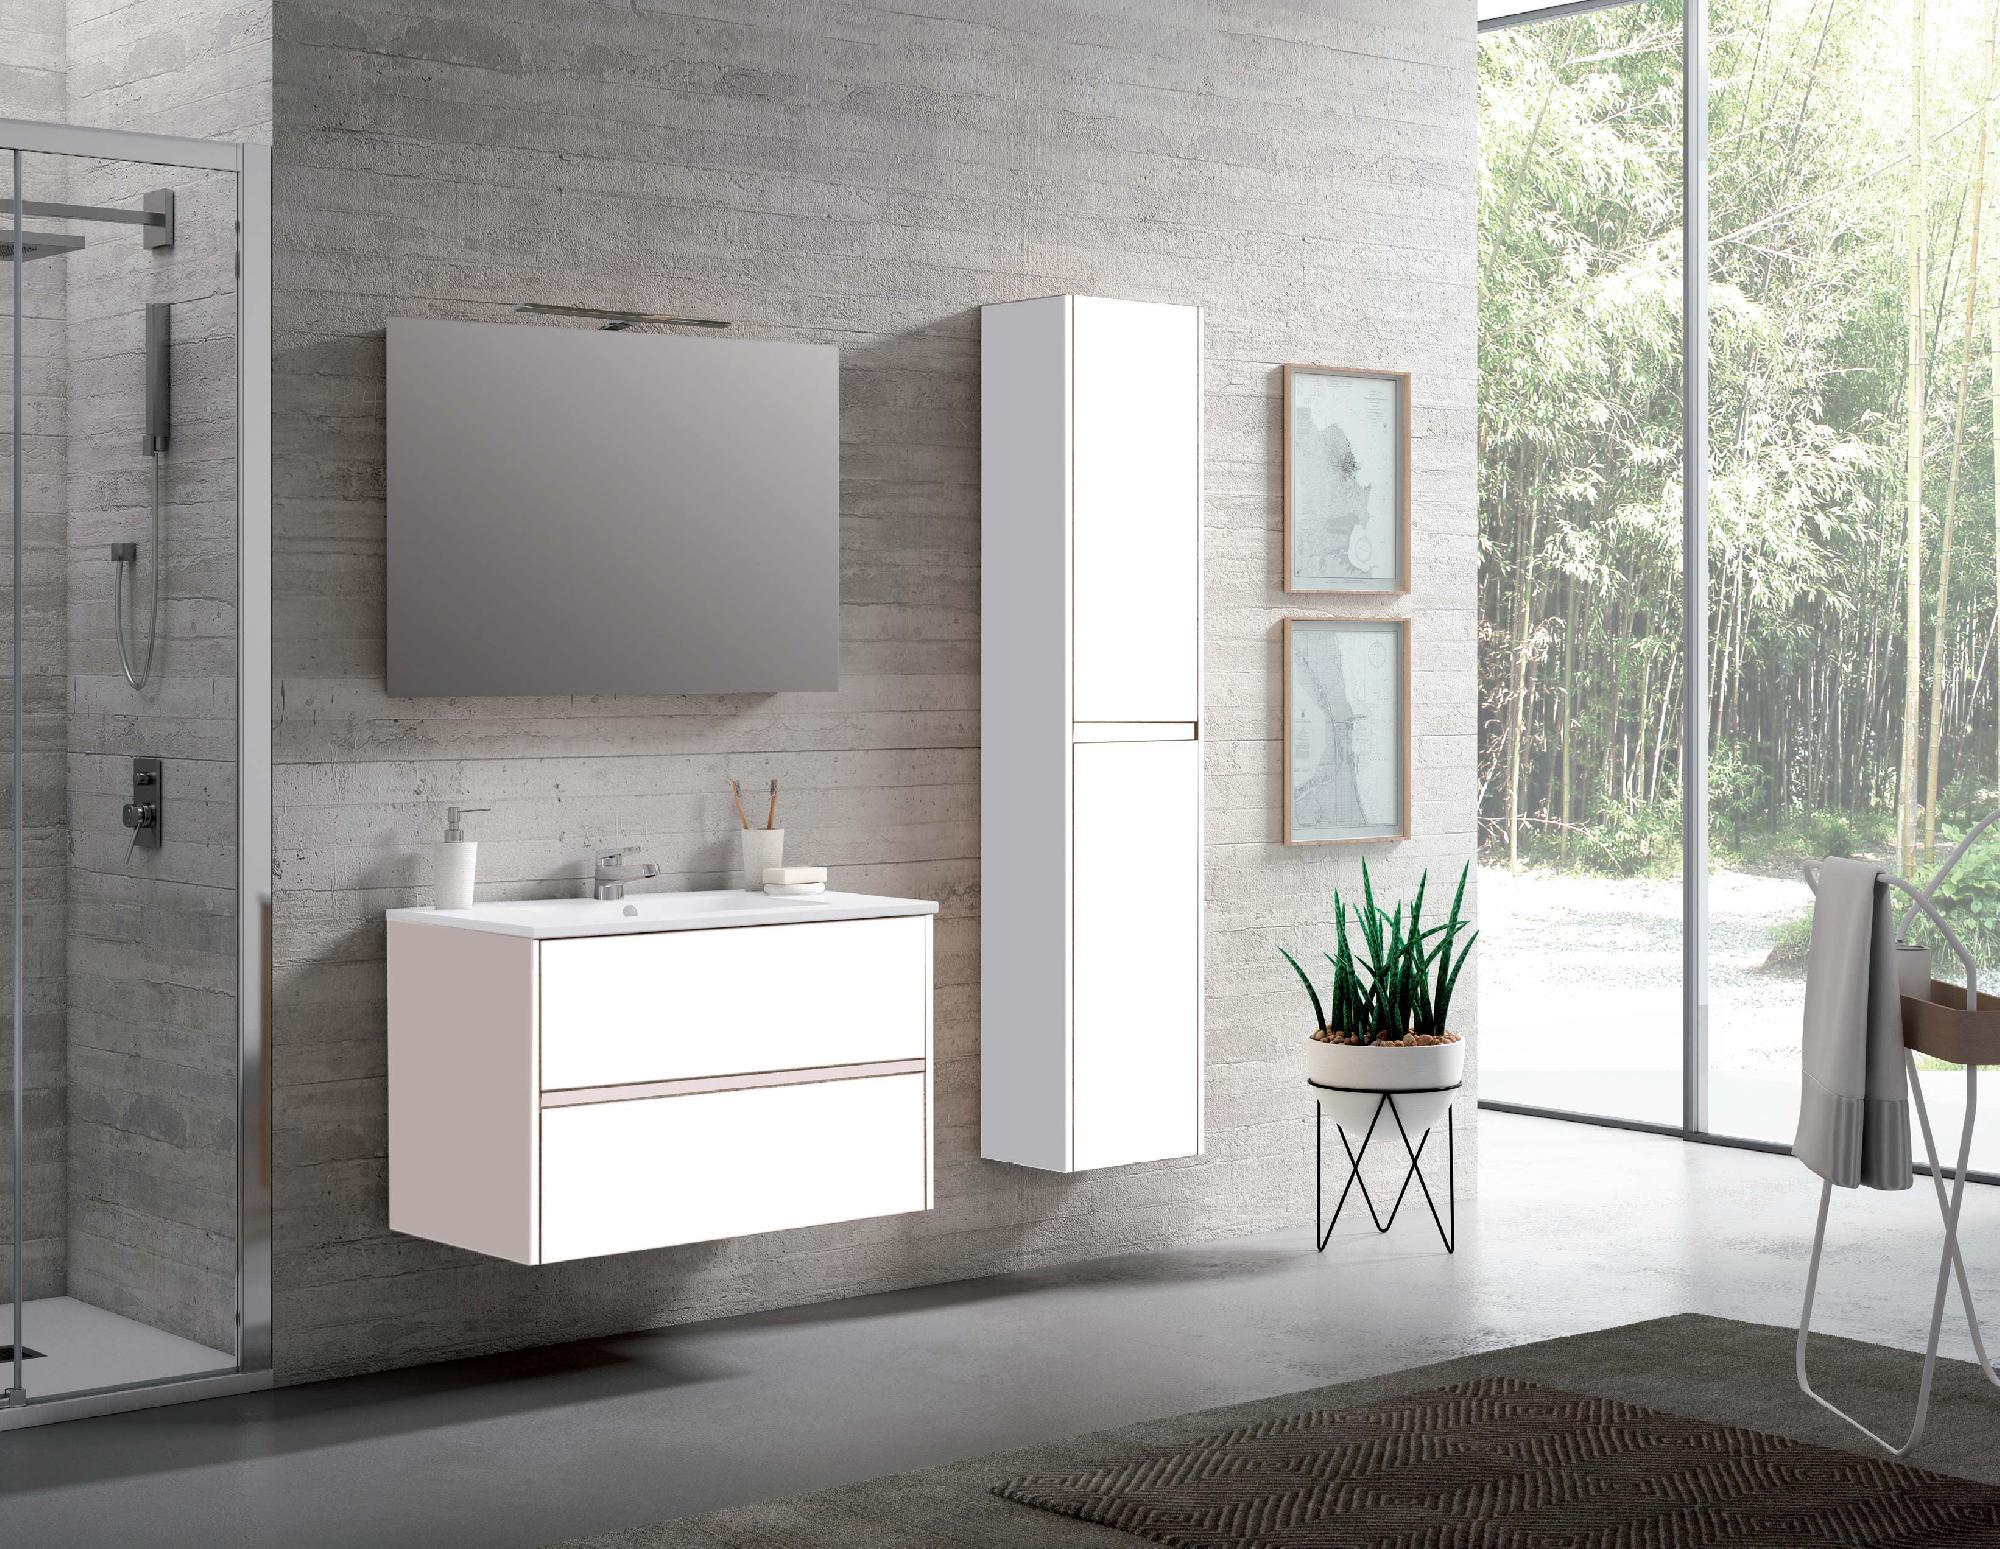 Mueble de baño colección Ten